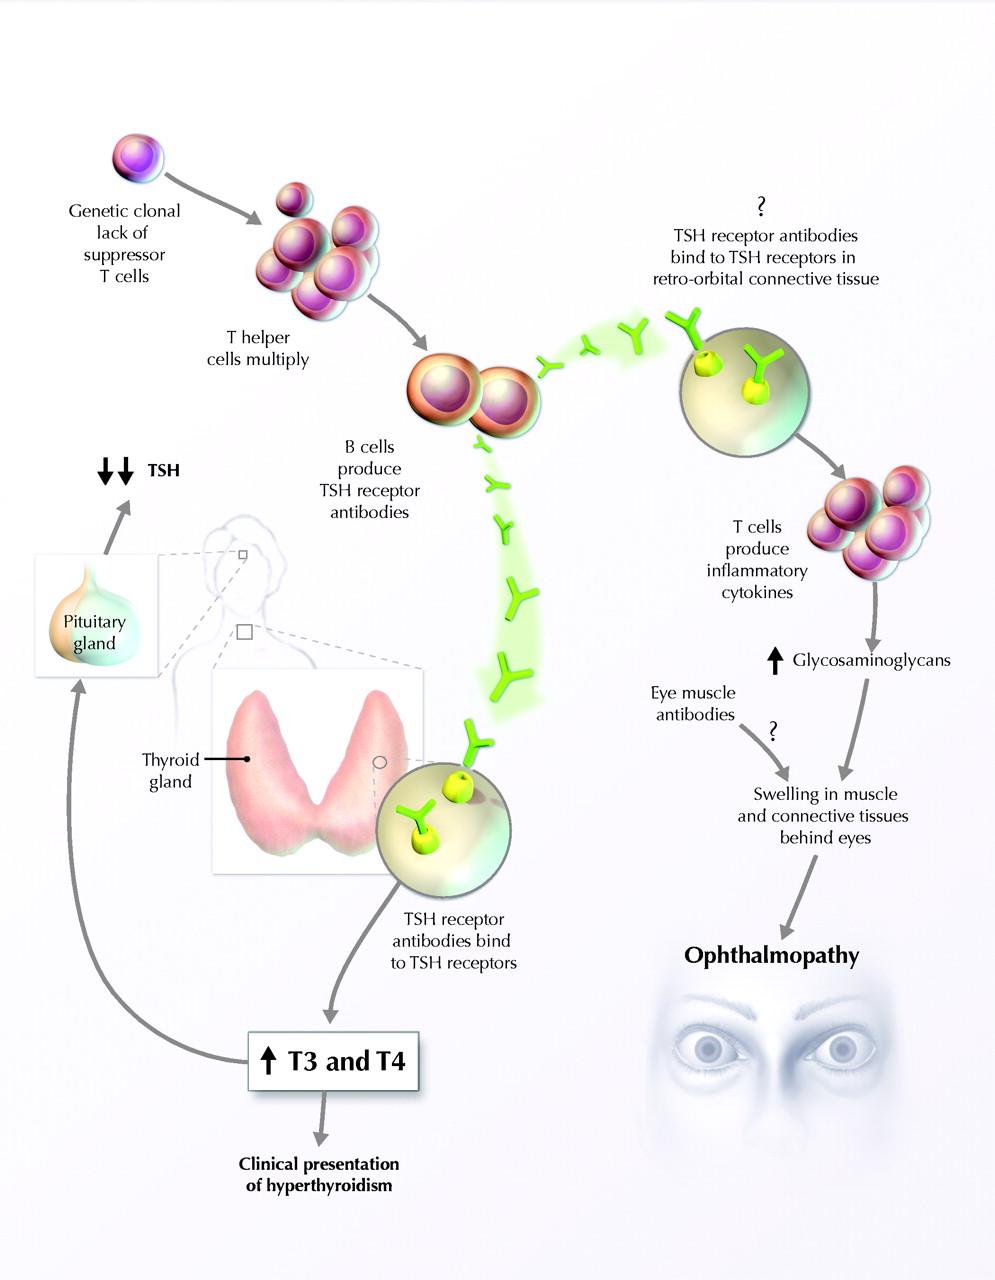 http://www.bio.davidson.edu/courses/immunology/students/spring2003/breedlove/gdiseasefigure6.jpg